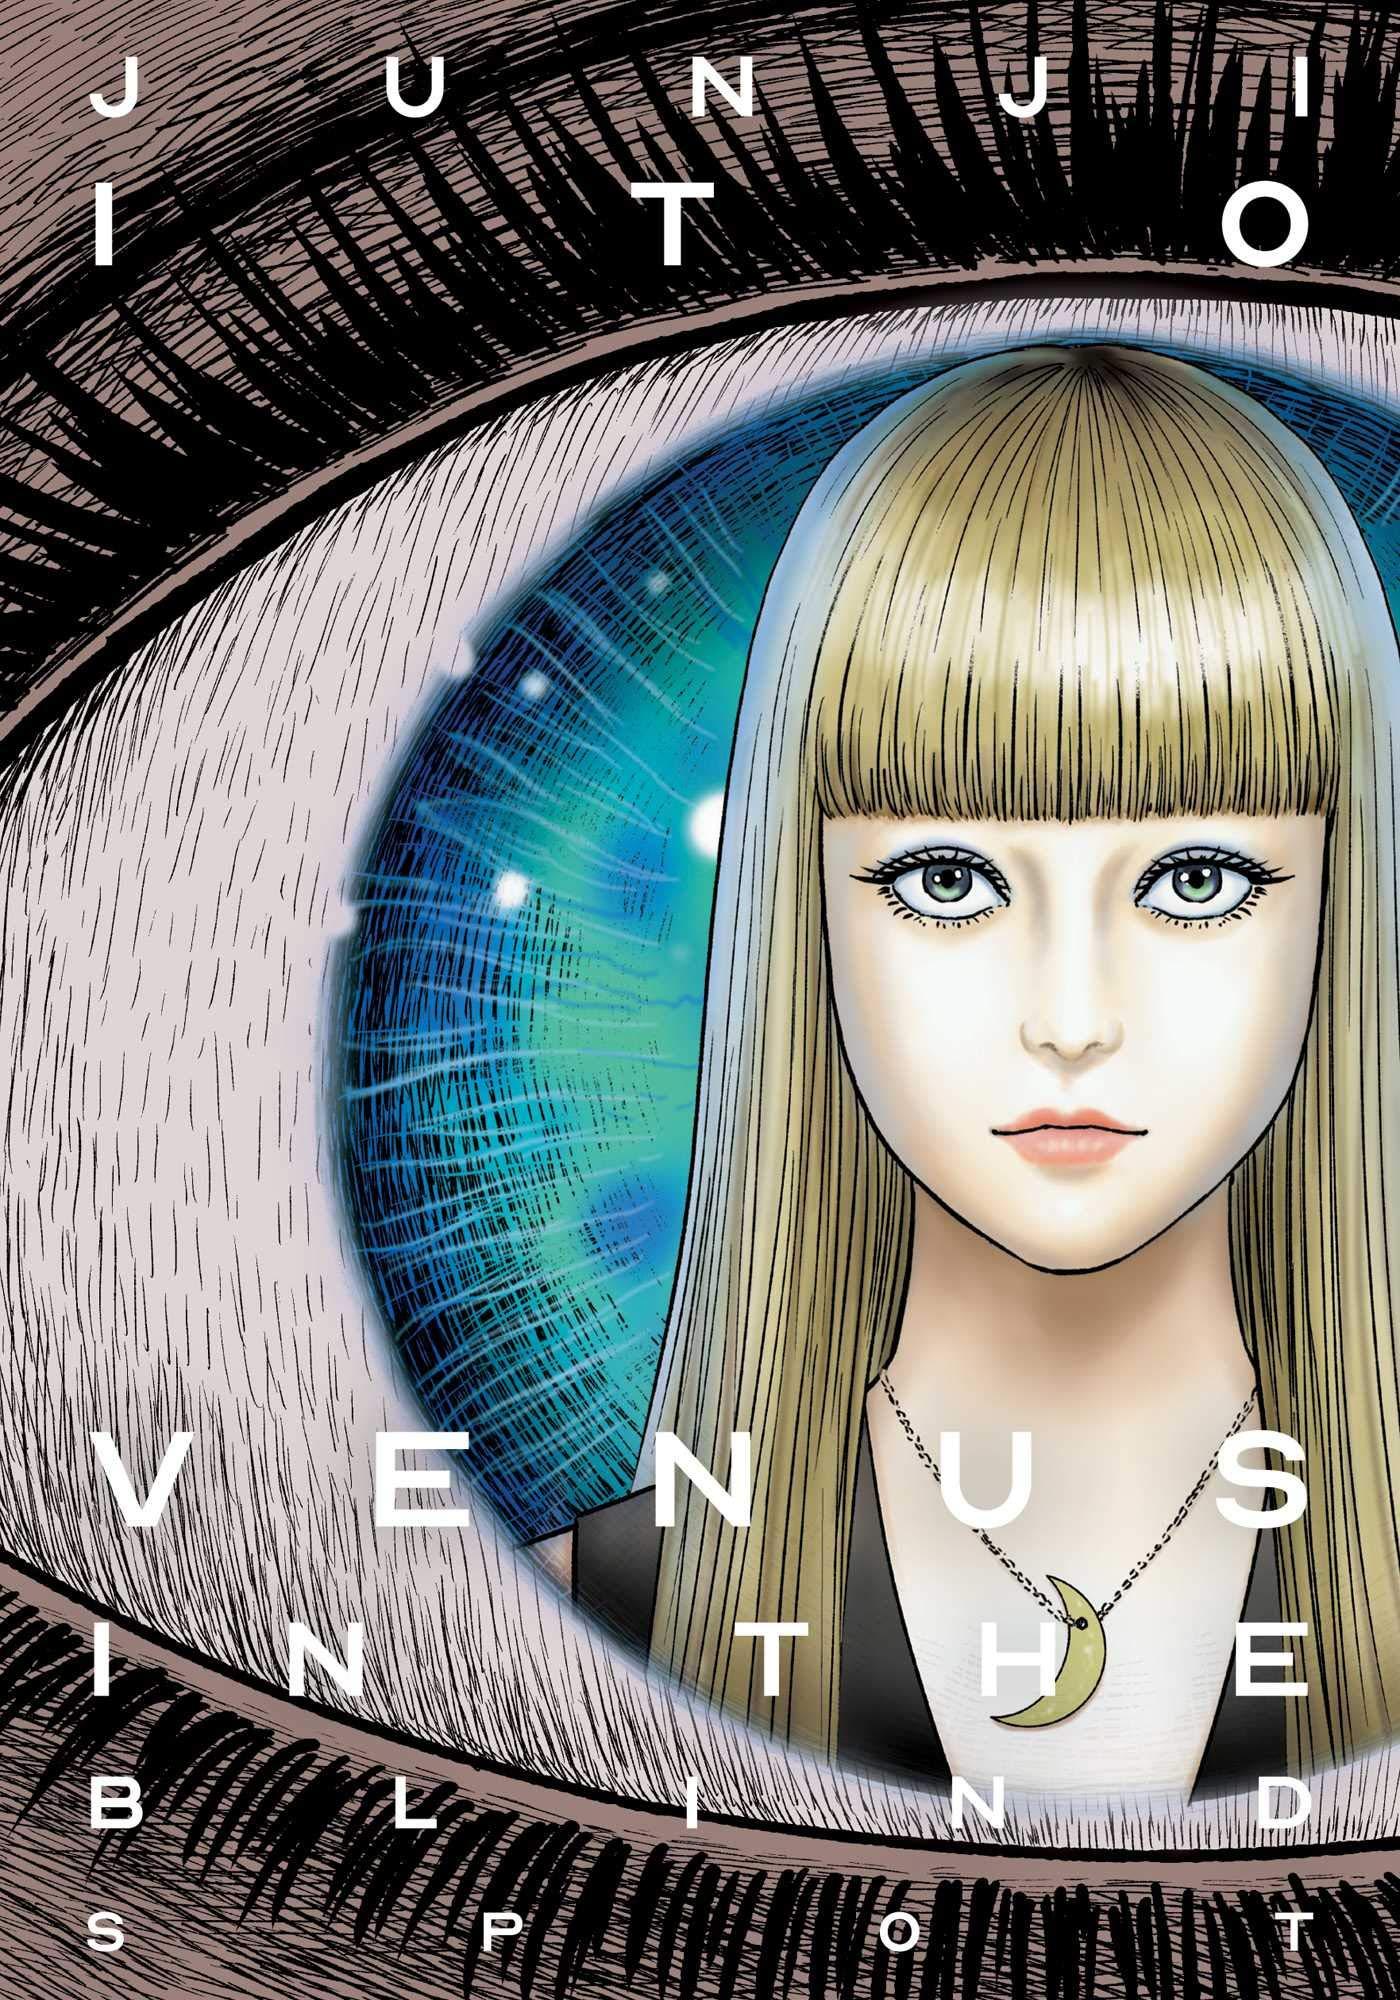 Venus in the Blind Spot: Ito, Junji: Amazon.com.mx: Libros